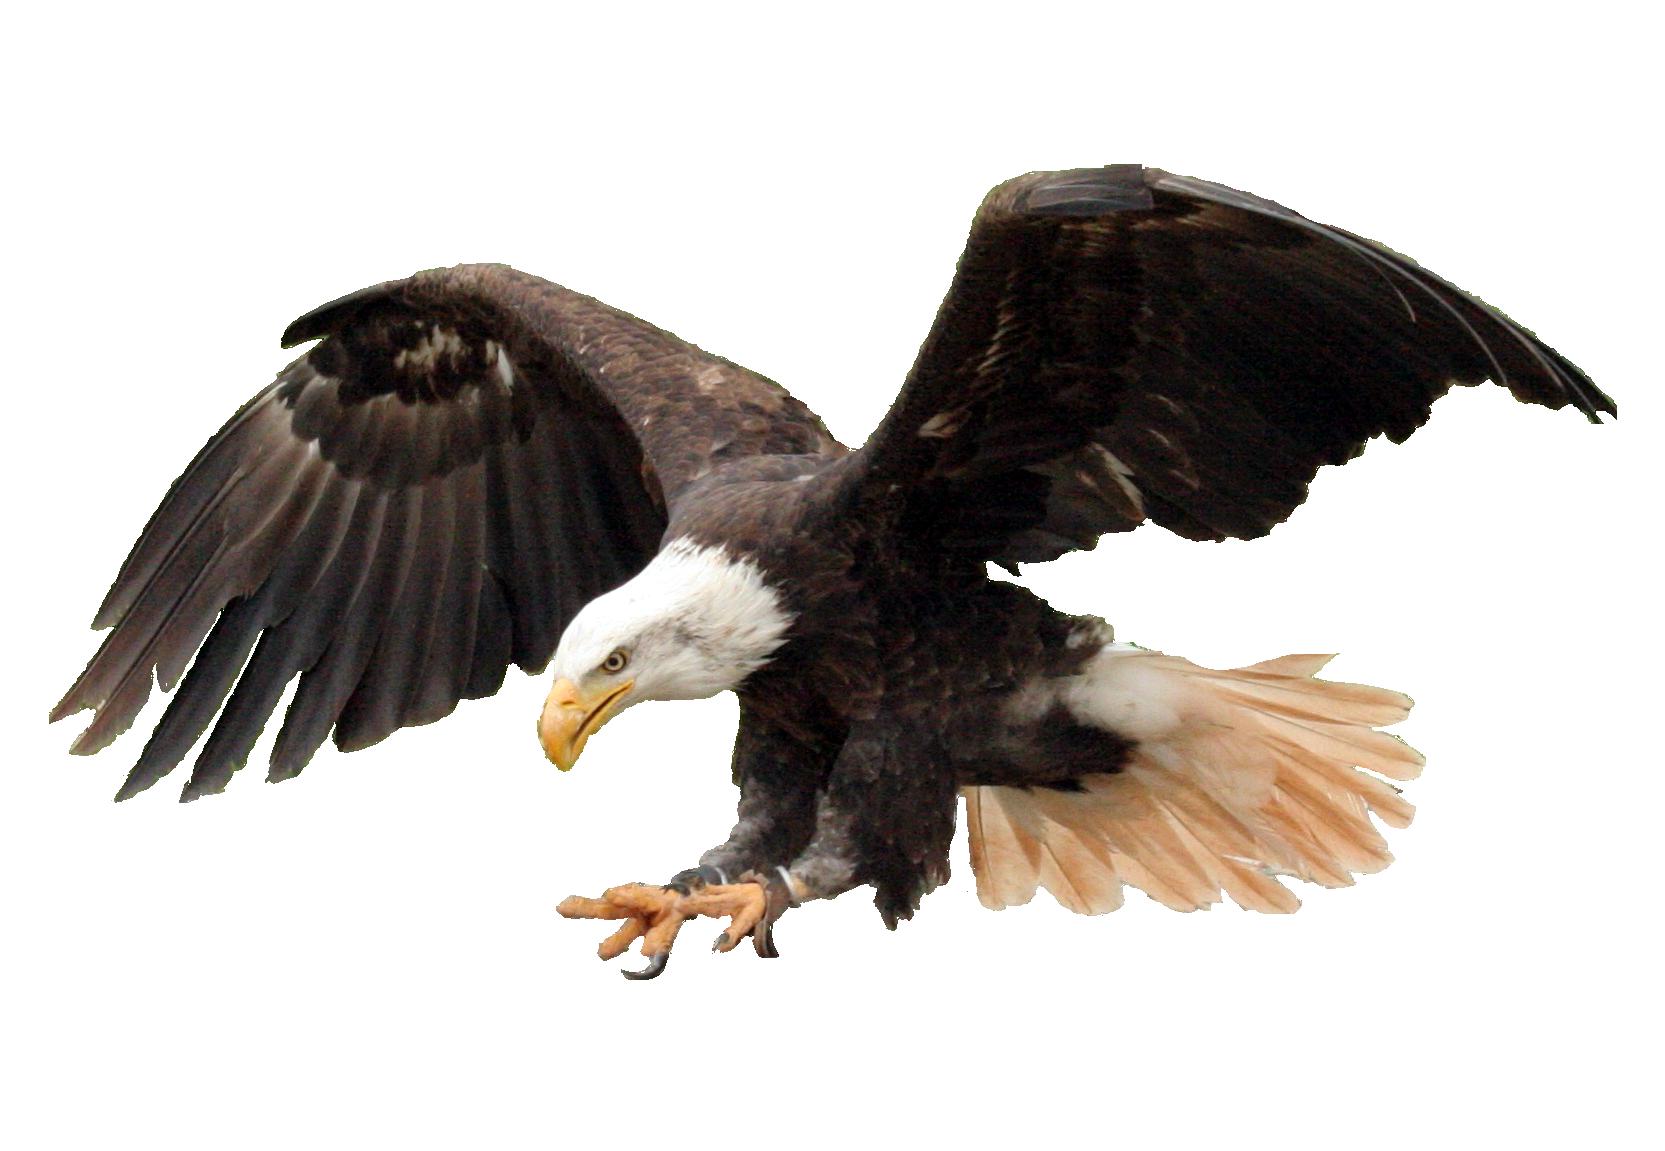 Hq png transparent images. Eagle clipart body